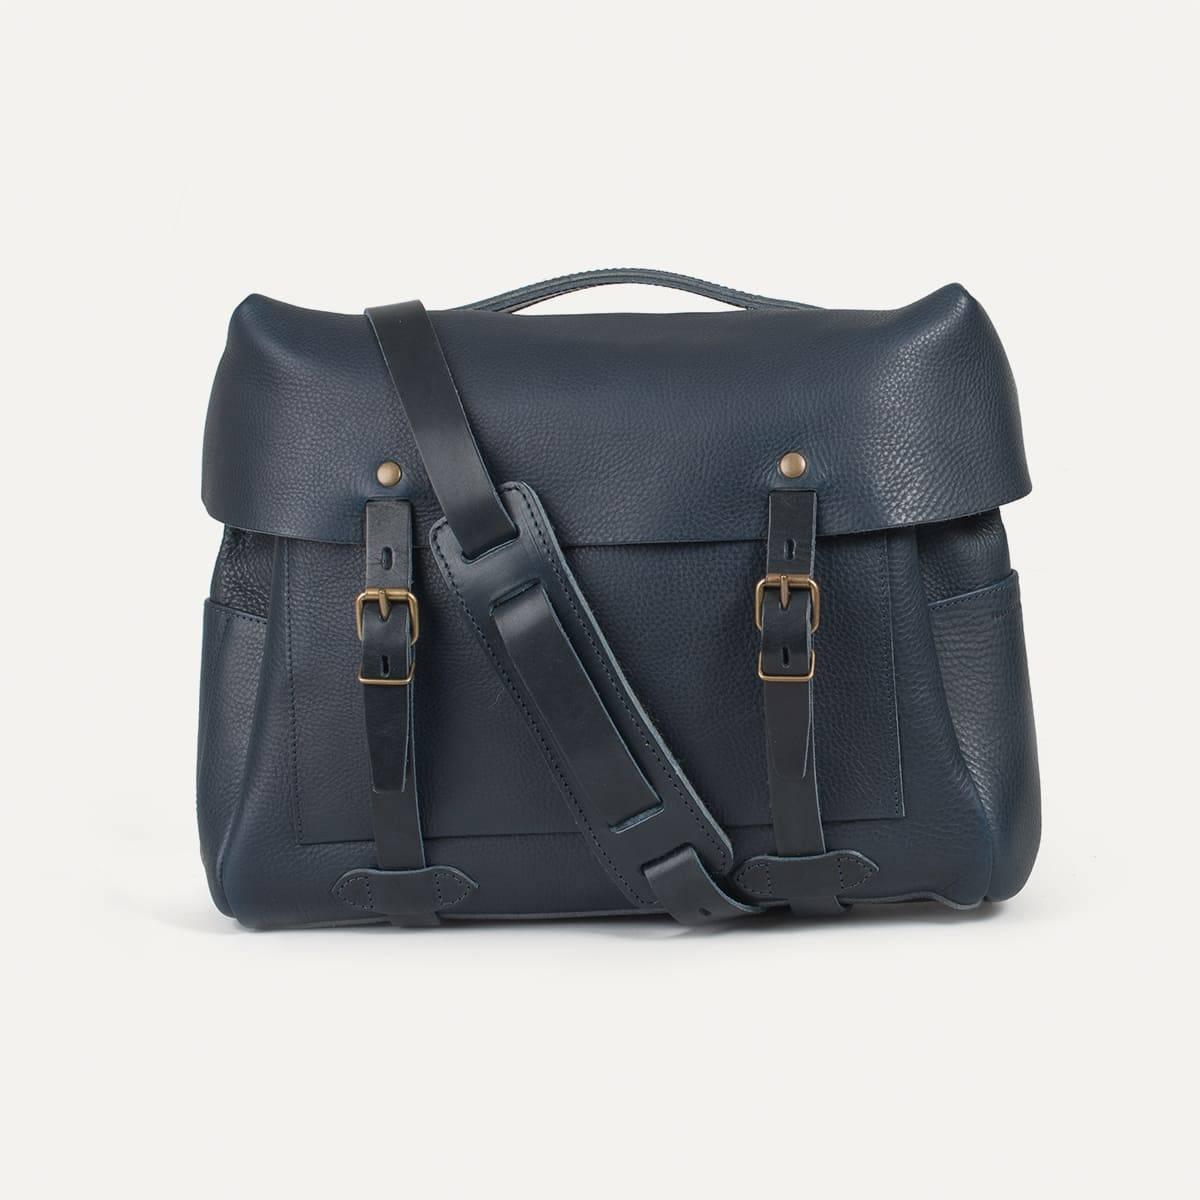 Bleu de Chauffe x Blitz Eclair bag - Navy (image n°1)